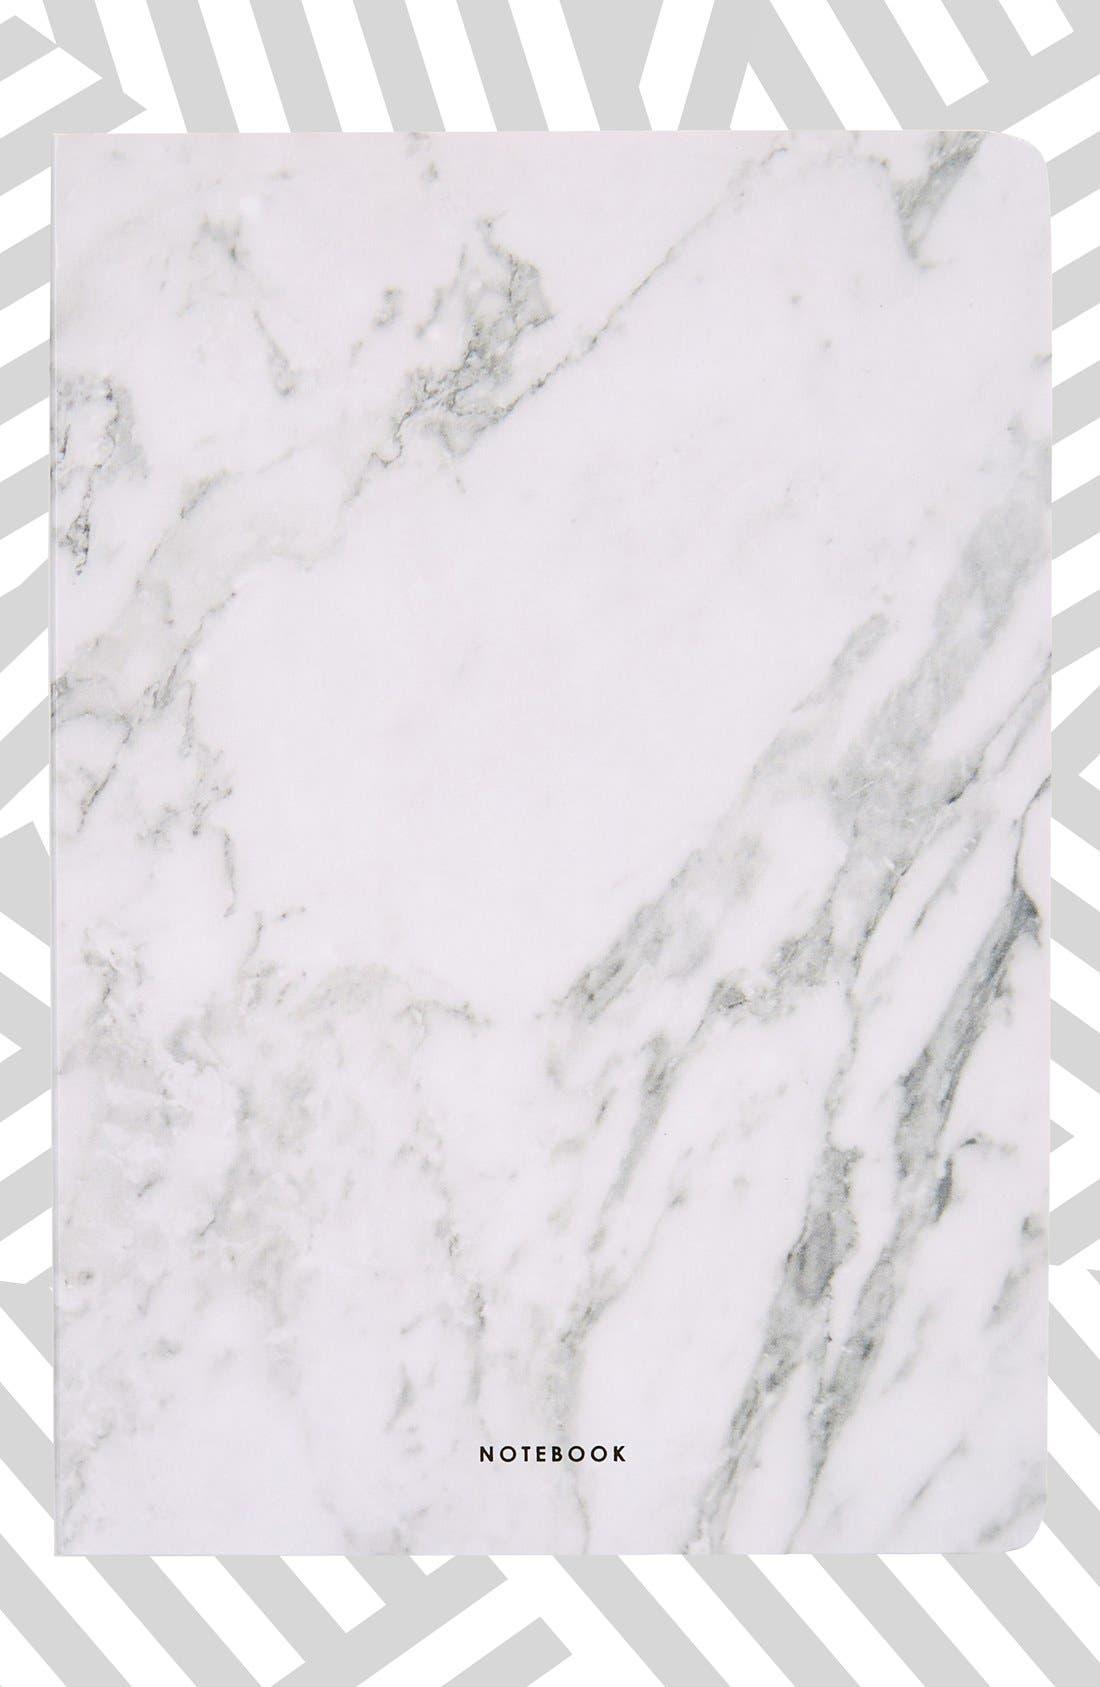 Alternate Image 1 Selected - Poketo 'Marble' Blank Notebook